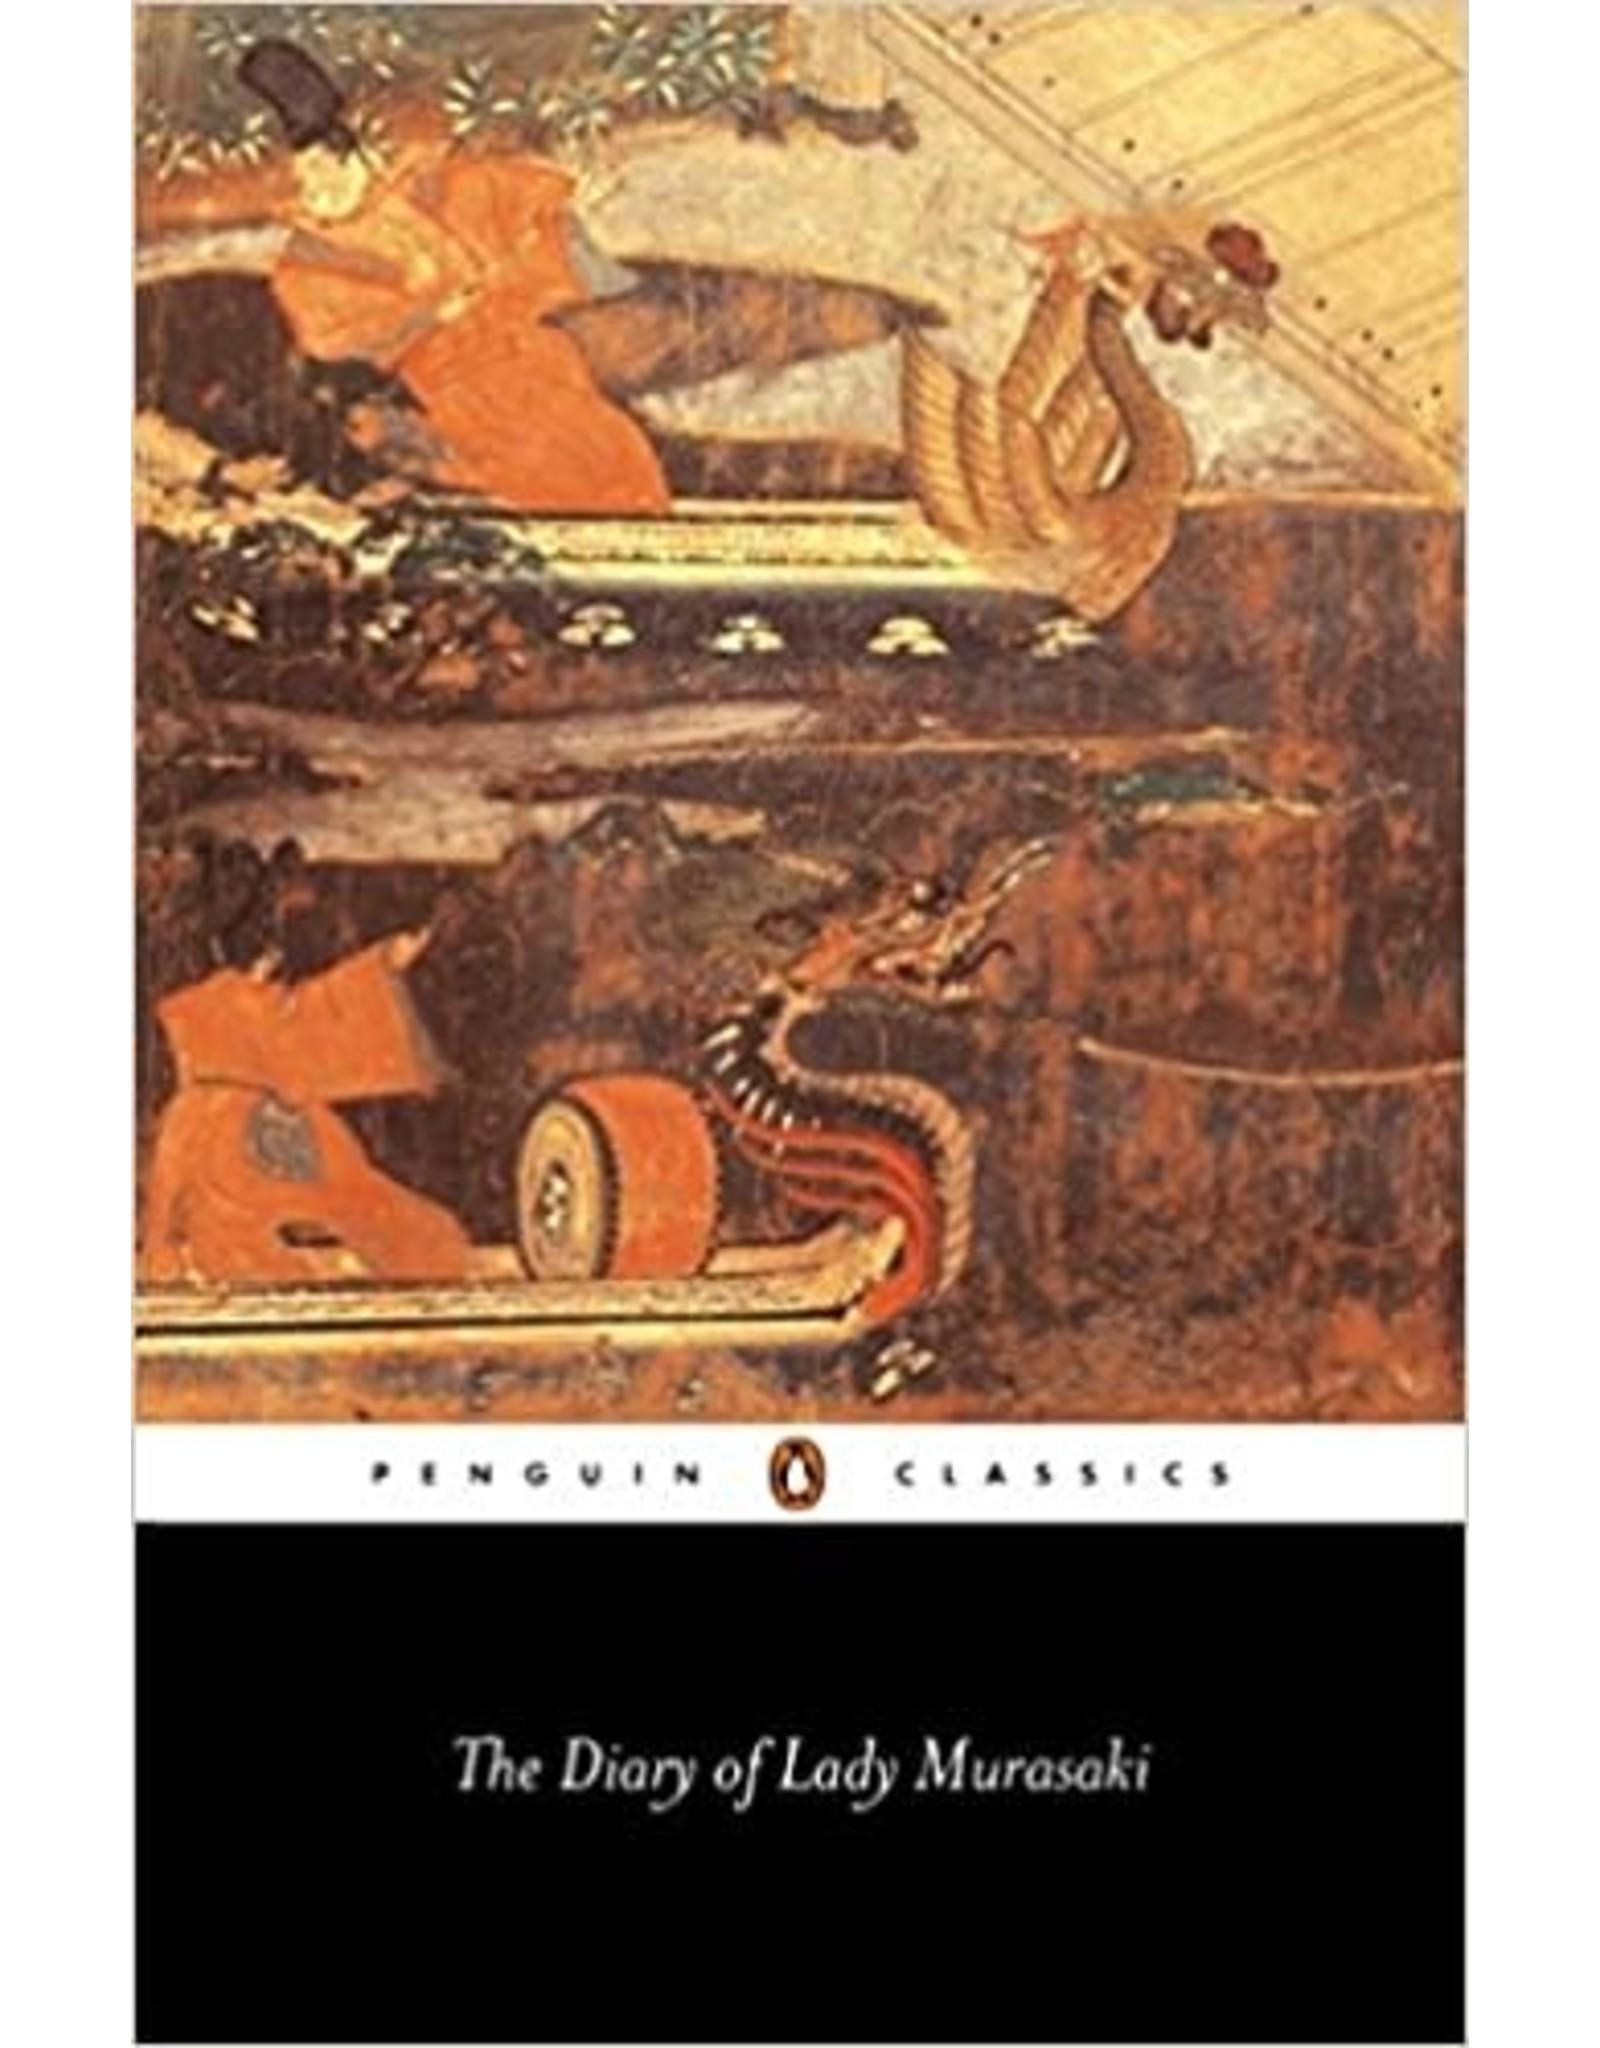 PENGUIN THE DIARY OF LADY MURASAKI